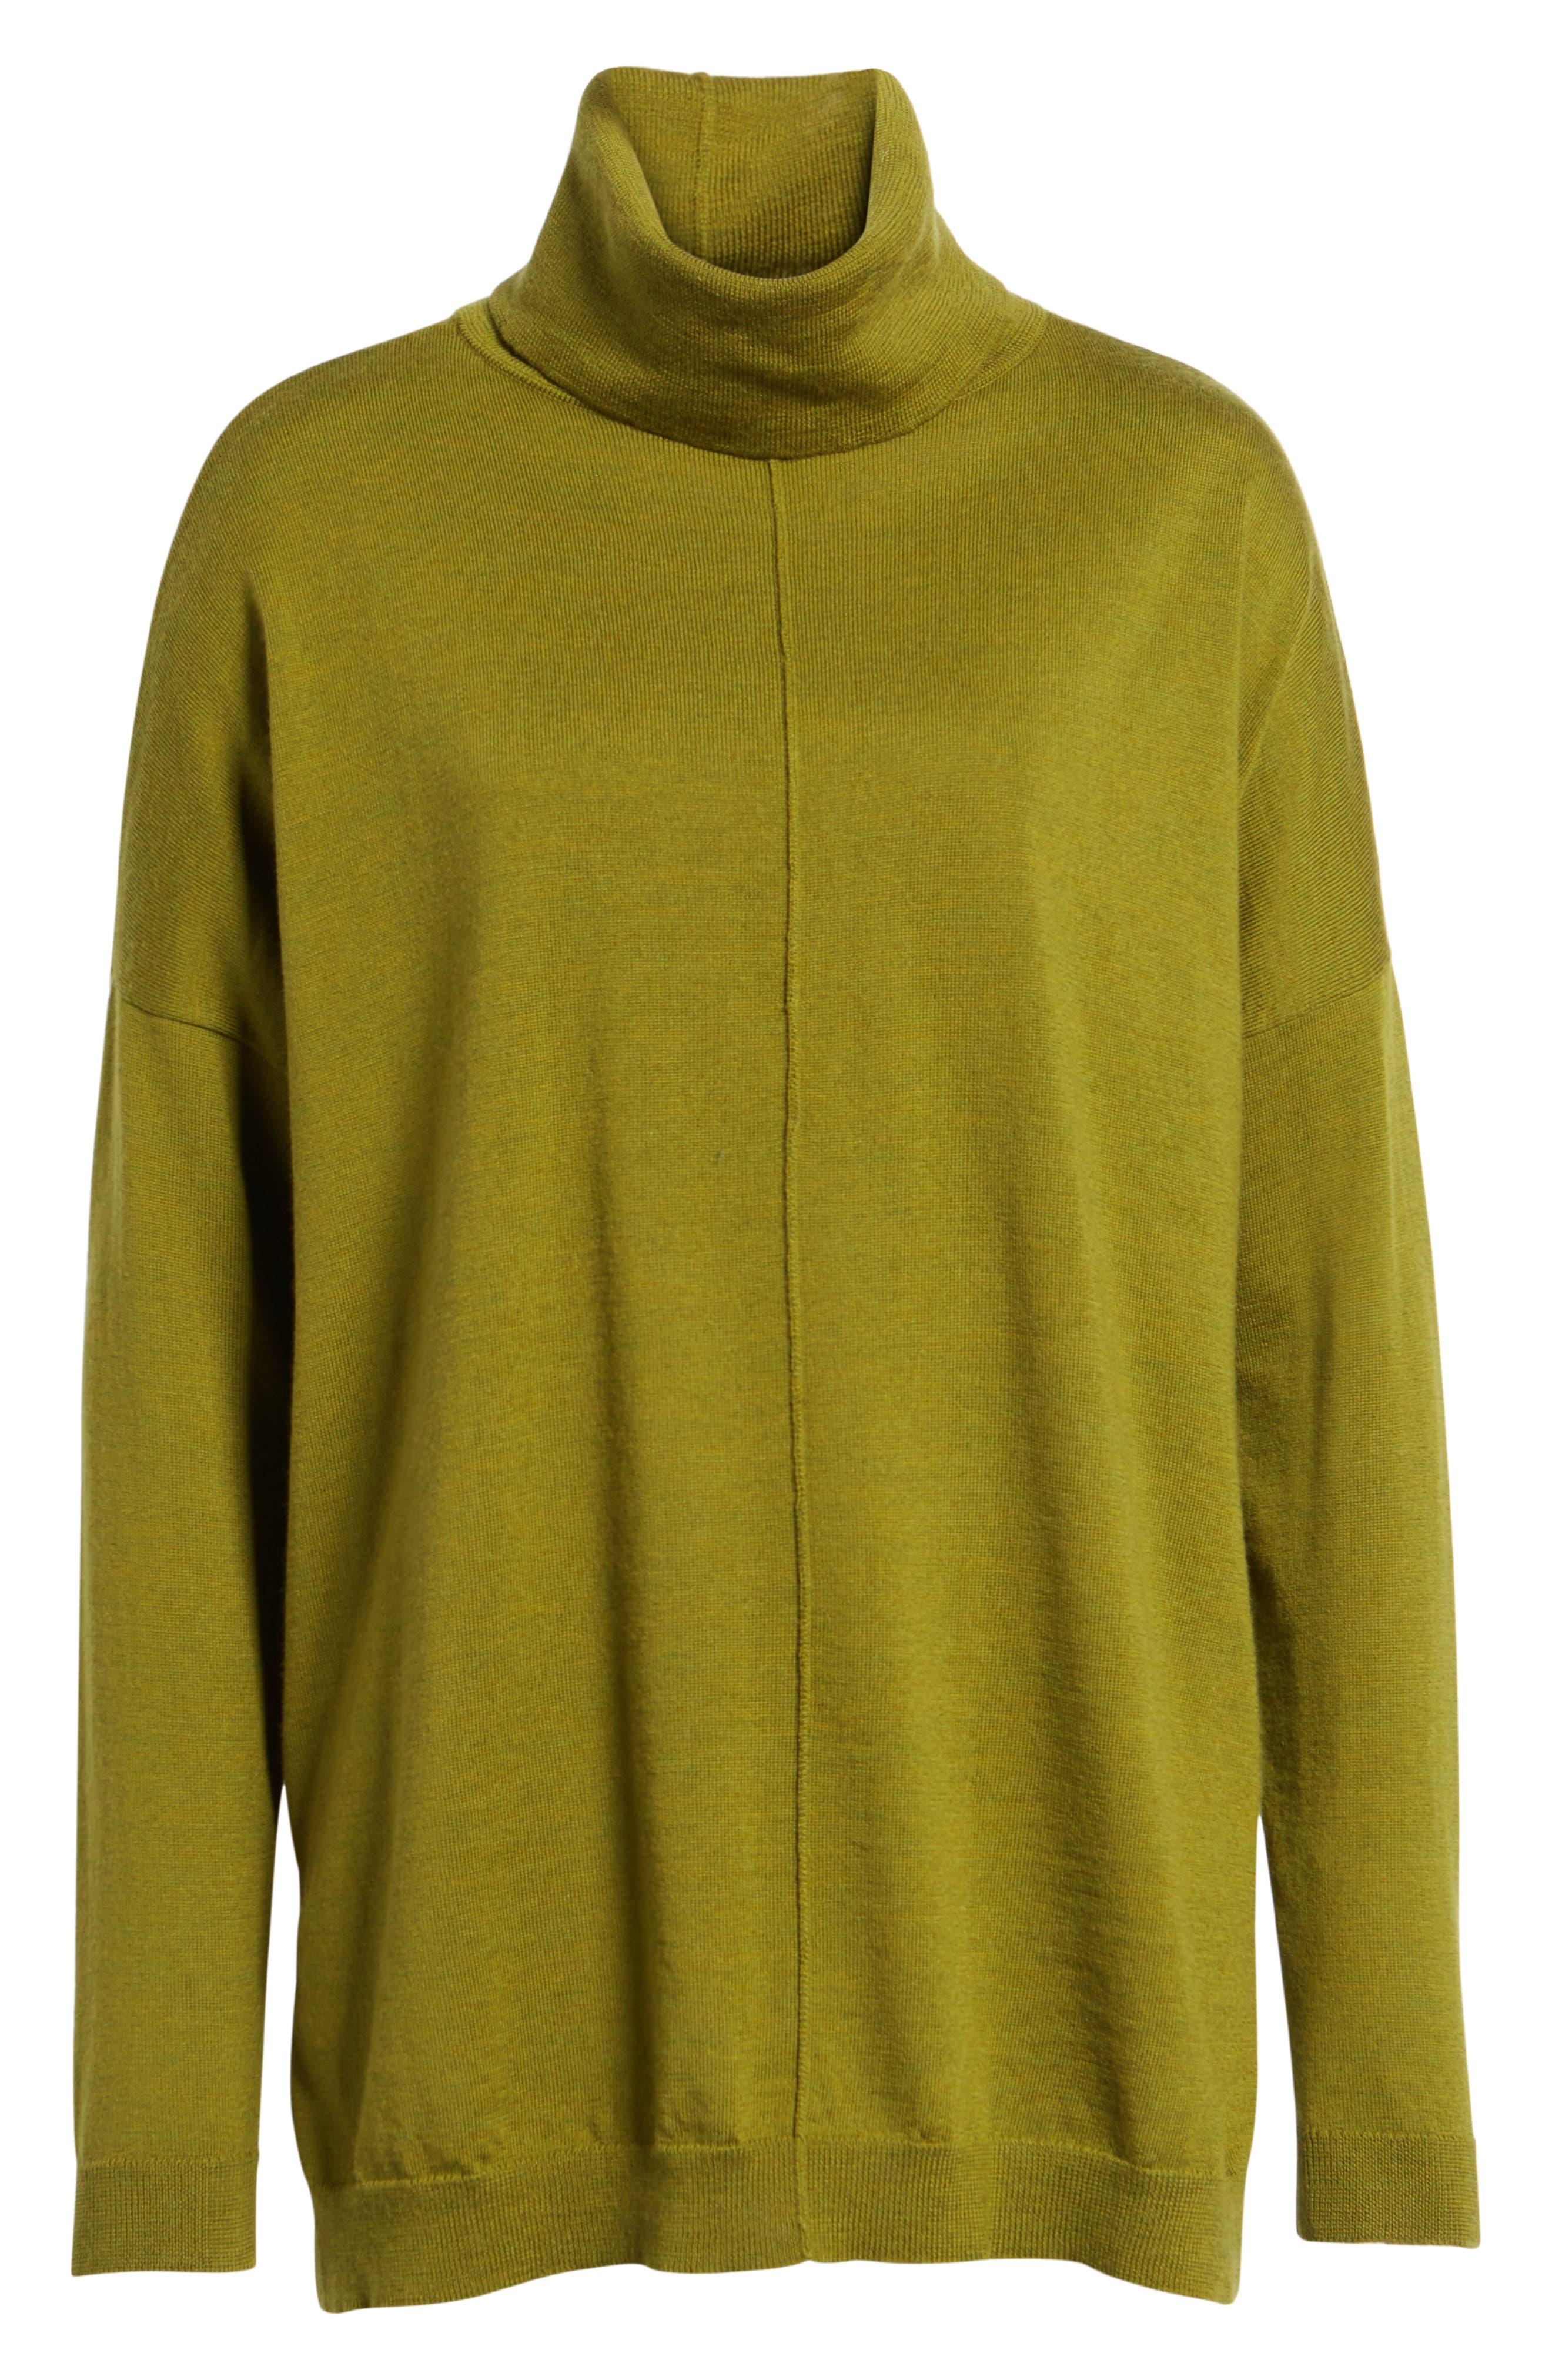 Merino Wool Boxy Turtleneck Sweater,                             Alternate thumbnail 32, color,